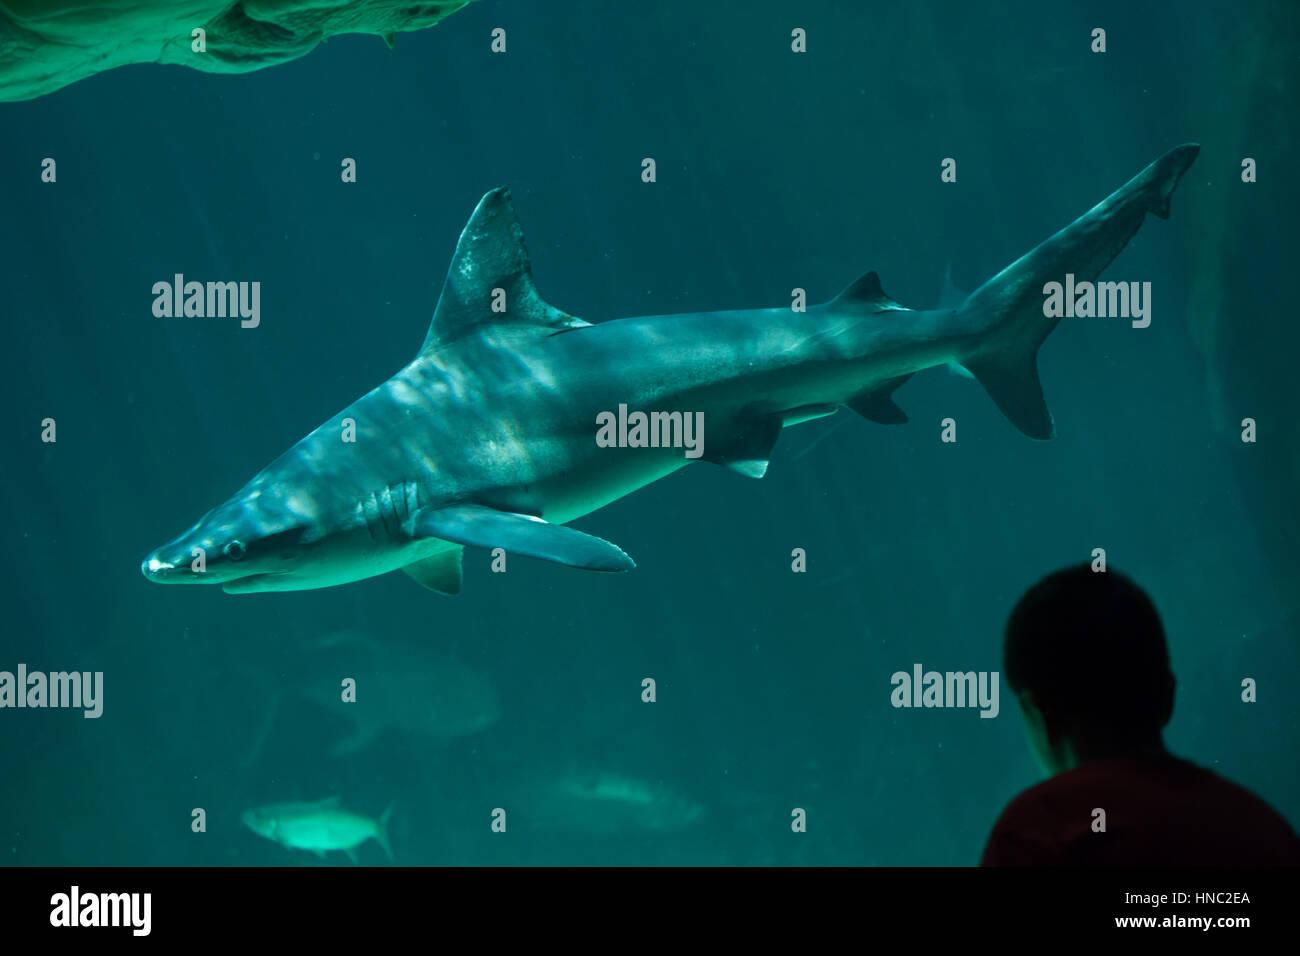 Young visitor looks as the sandbar shark (Carcharhinus plumbeus) swimming in Madrid Aquarium, Spain. - Stock Image